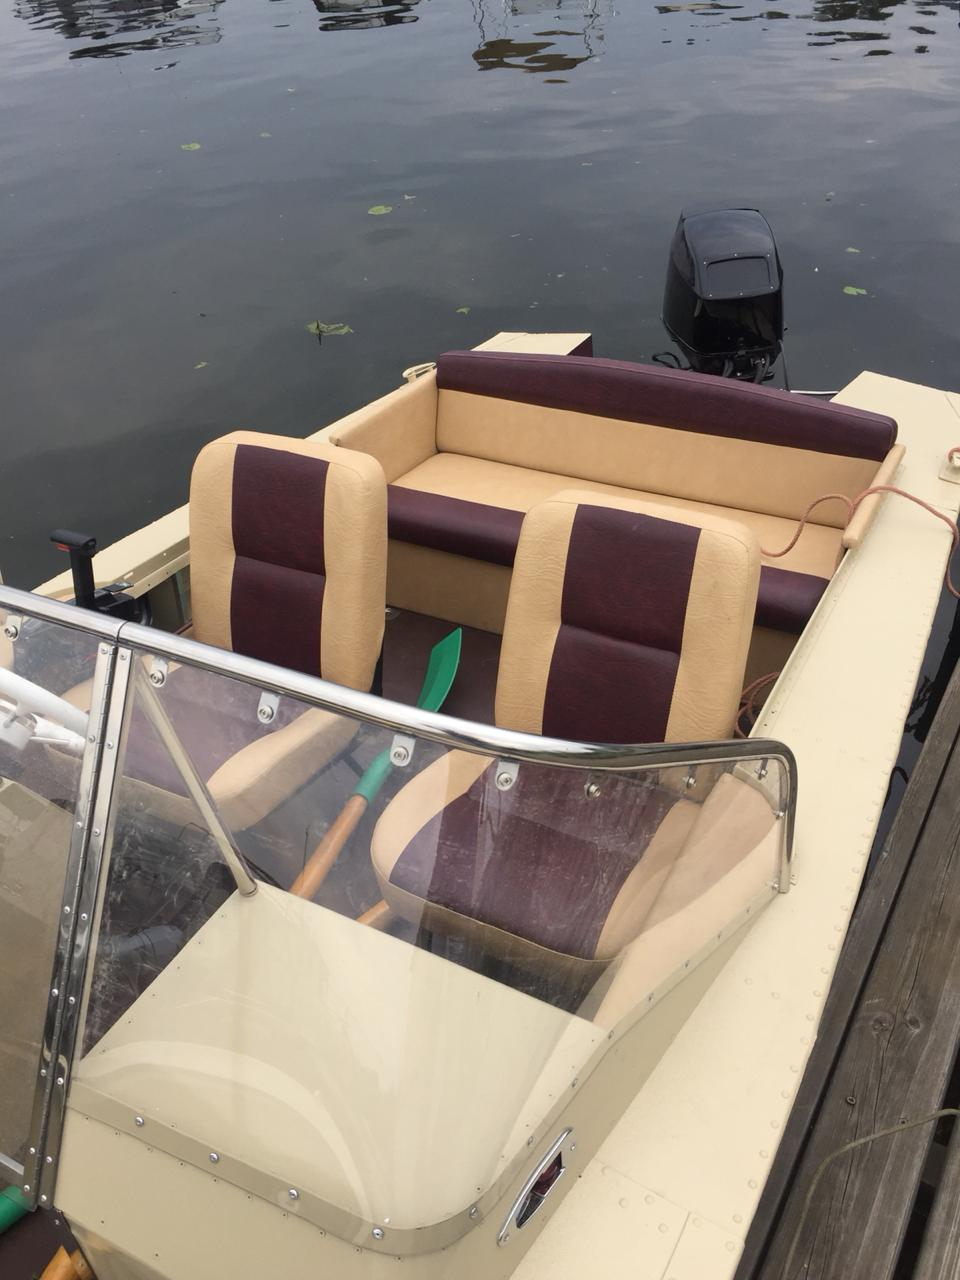 Тюнинг катера «Прогресс 2м» цена в компании «МаринЛайн». Ссылка на фотографию: http://marinline.ru/uploads/posts/2018-08/1533720884_photo-2018-08-07-15-42-46-2.jpg